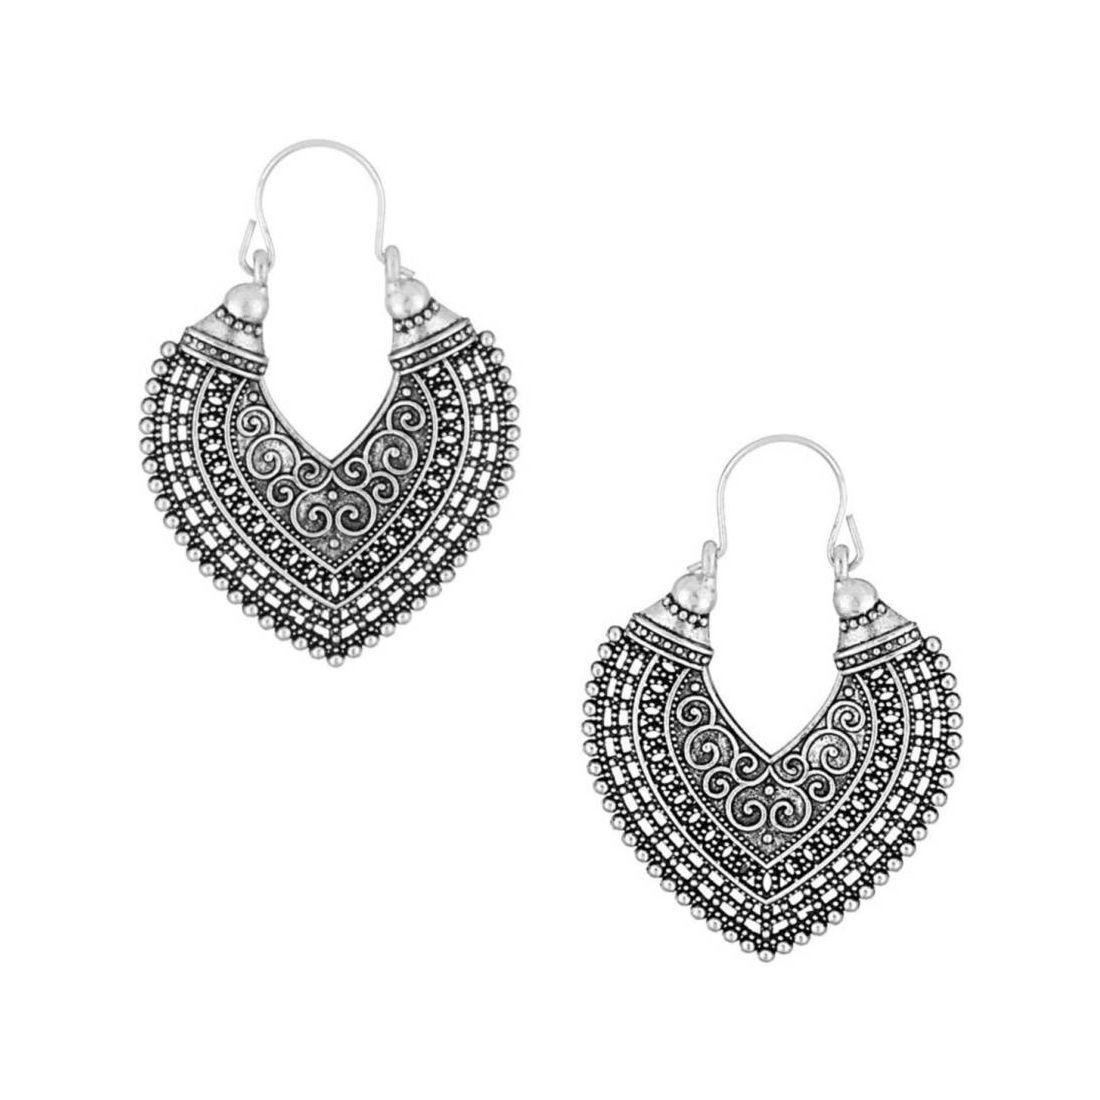 Bandish Antique Oxidised Silver Heart shaped Hoop Earring